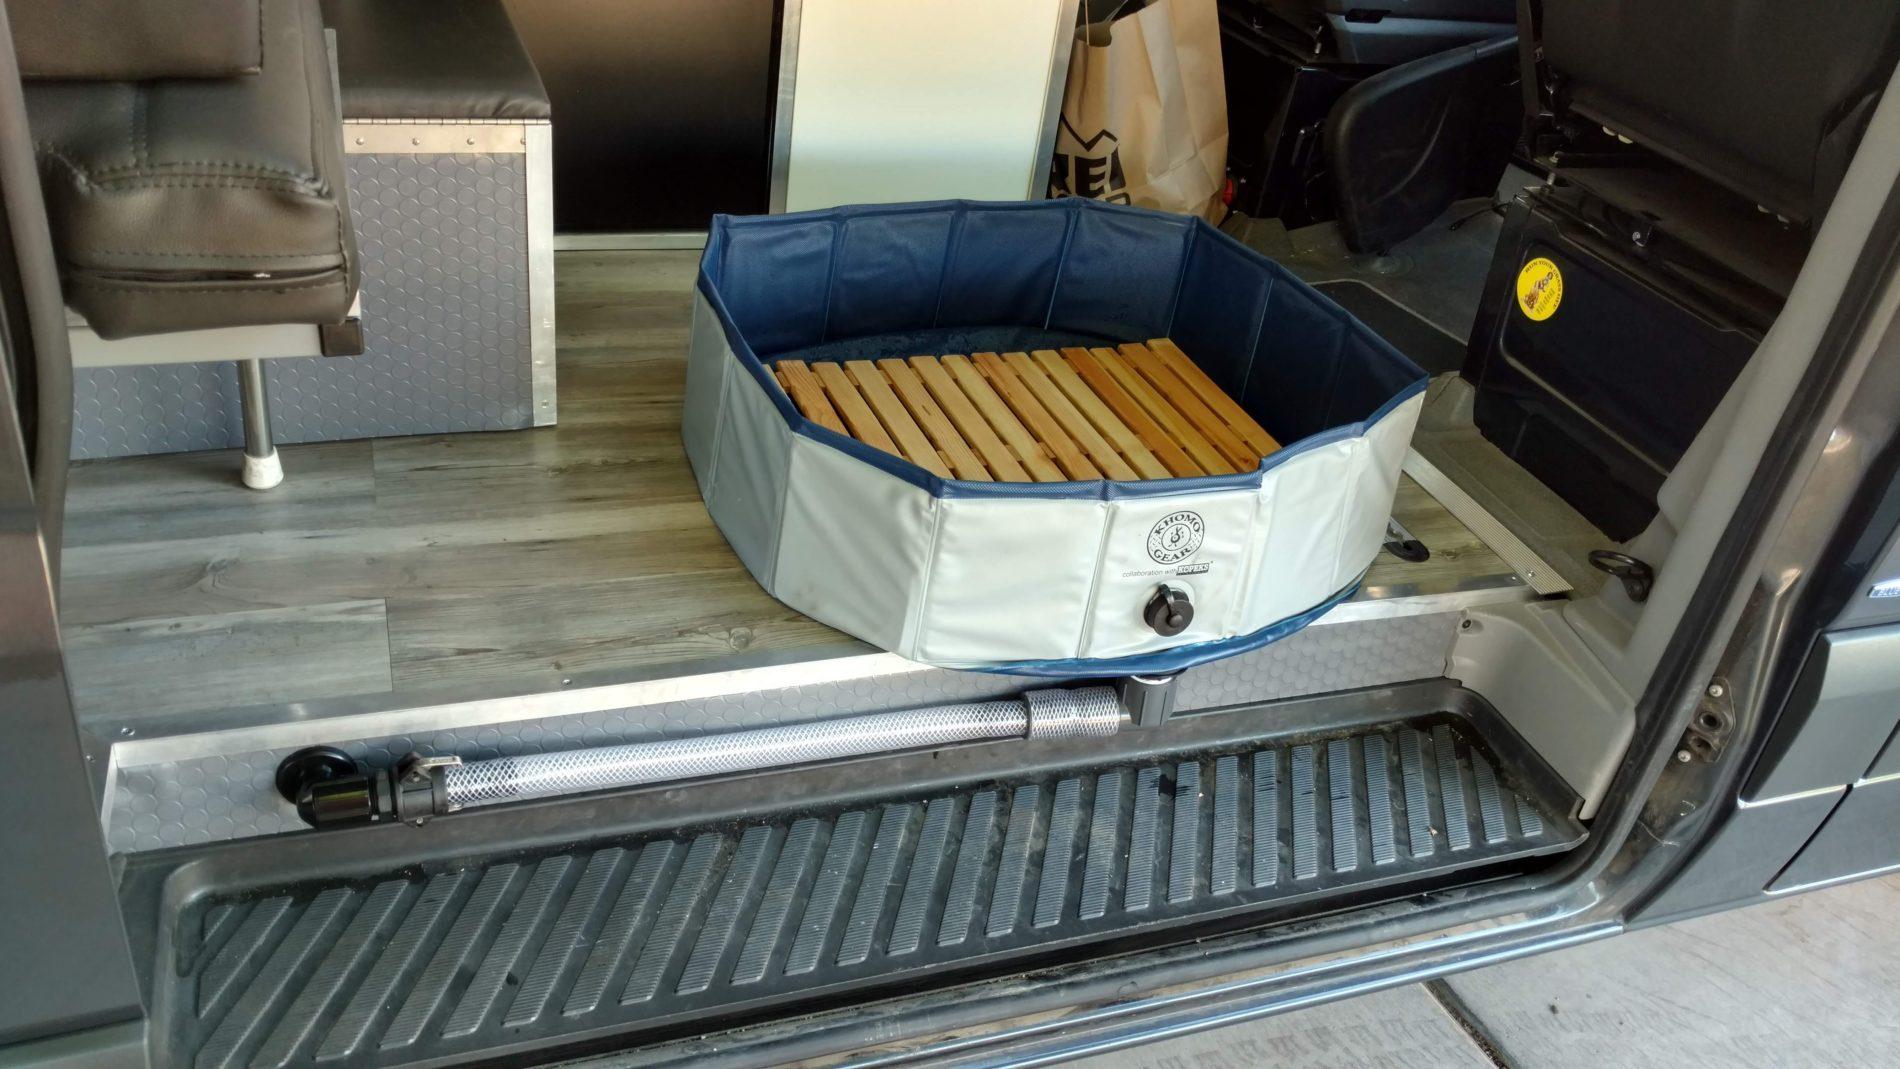 Building An Indoor Portable Shower For Our Sprinter Campervan